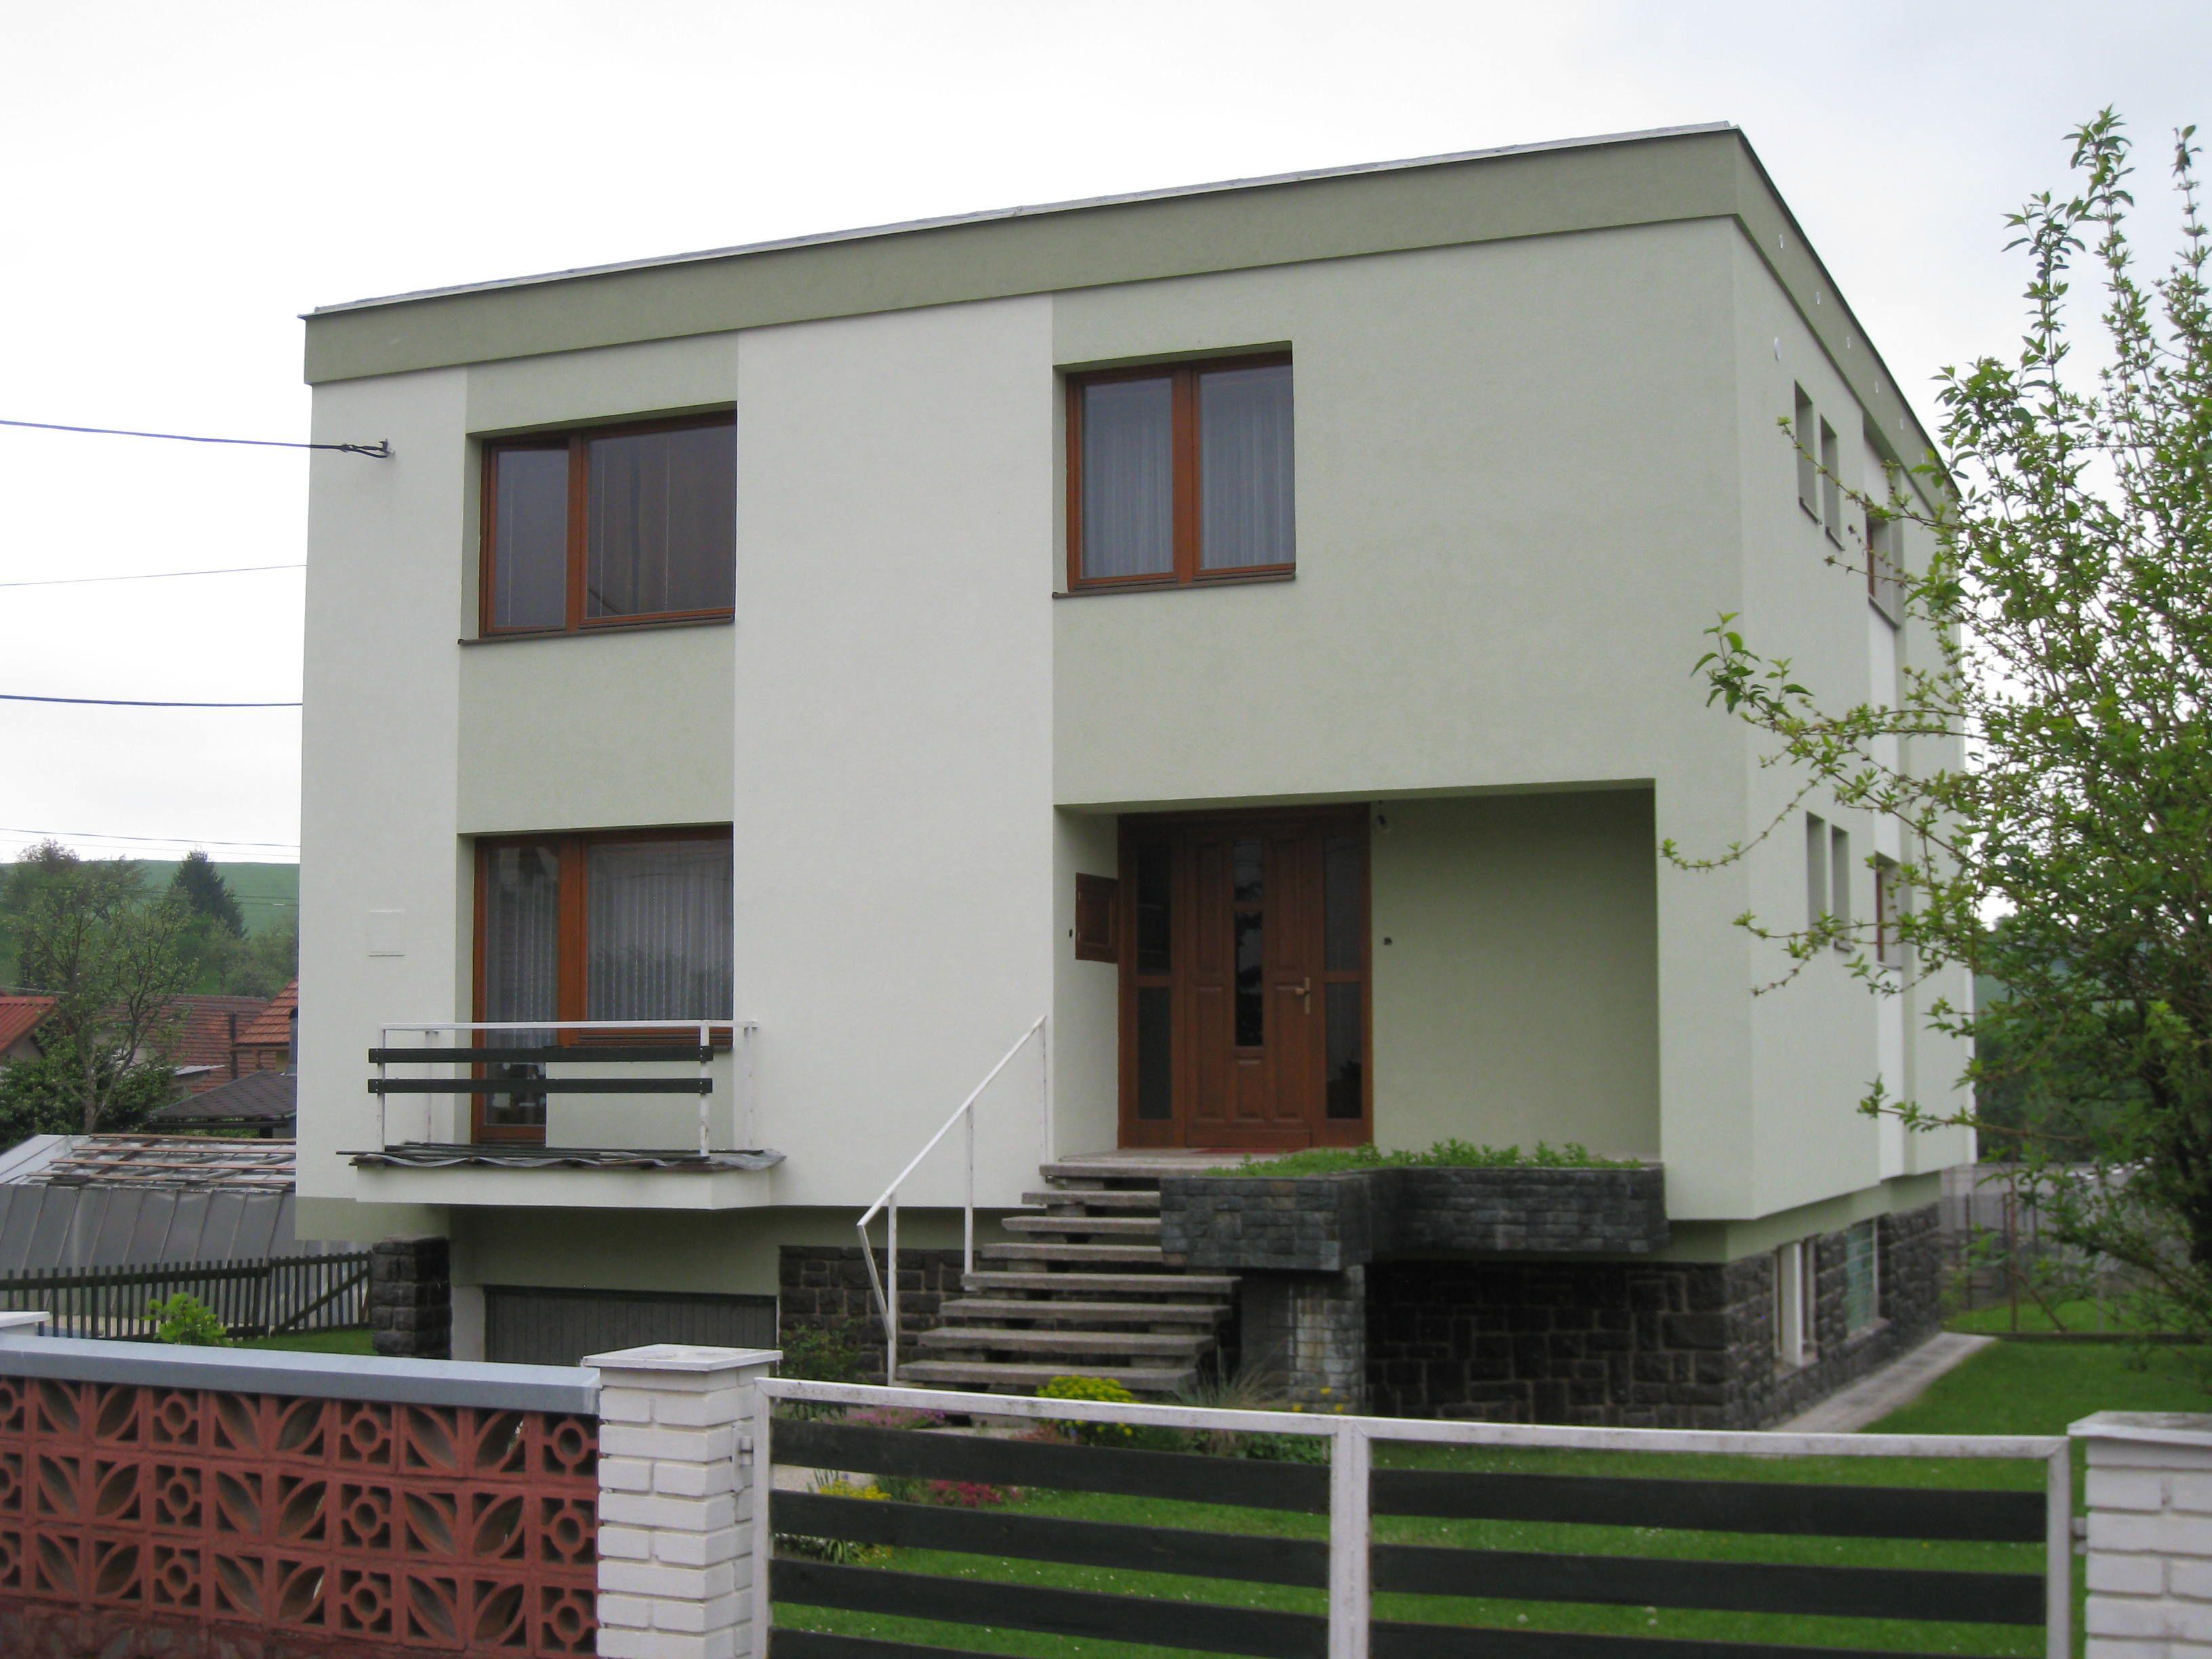 Fasáda exteriéru rodinného domu Realizované projekty